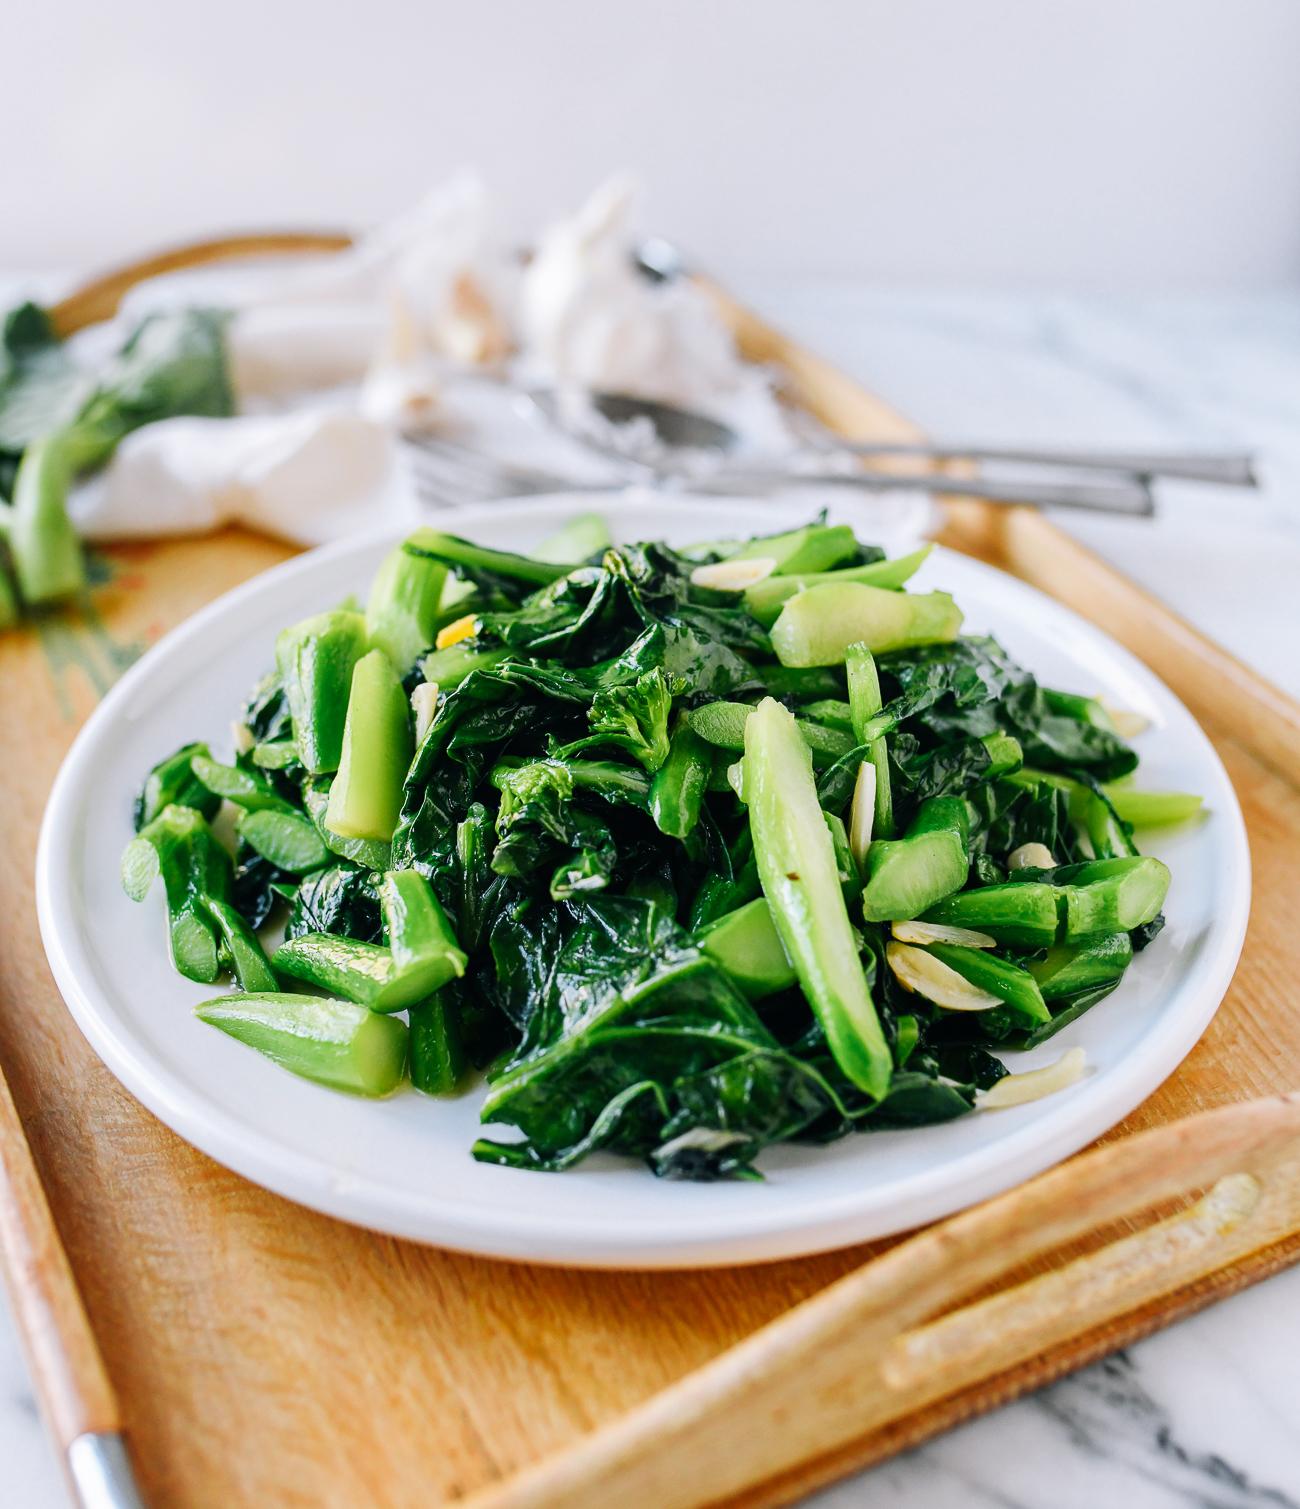 Chinese Broccoli Stir-fry